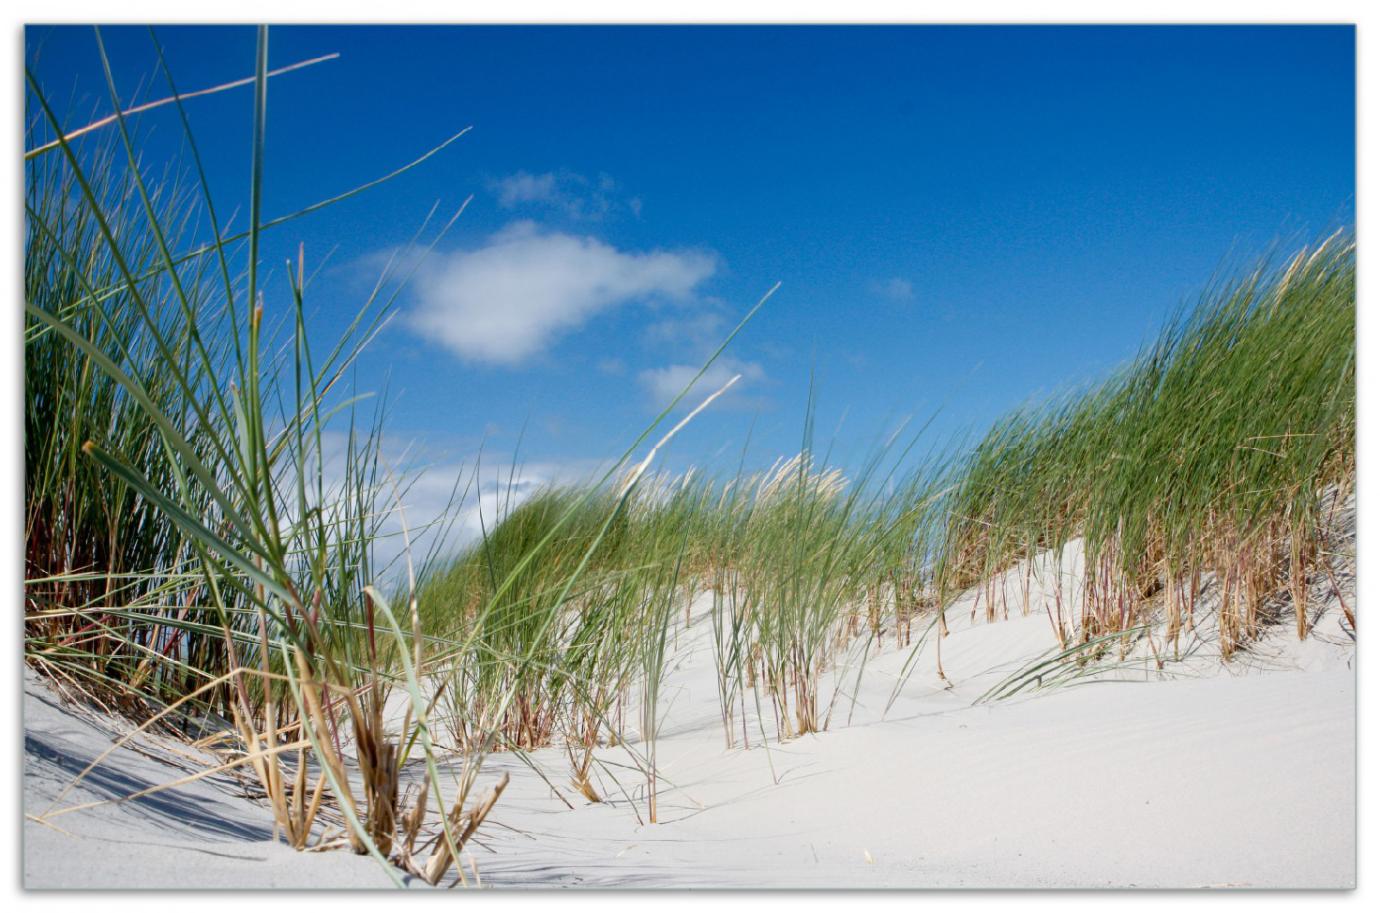 Herdabdeckplatte Düne am Strand unter blauem Himmel – Bild 1